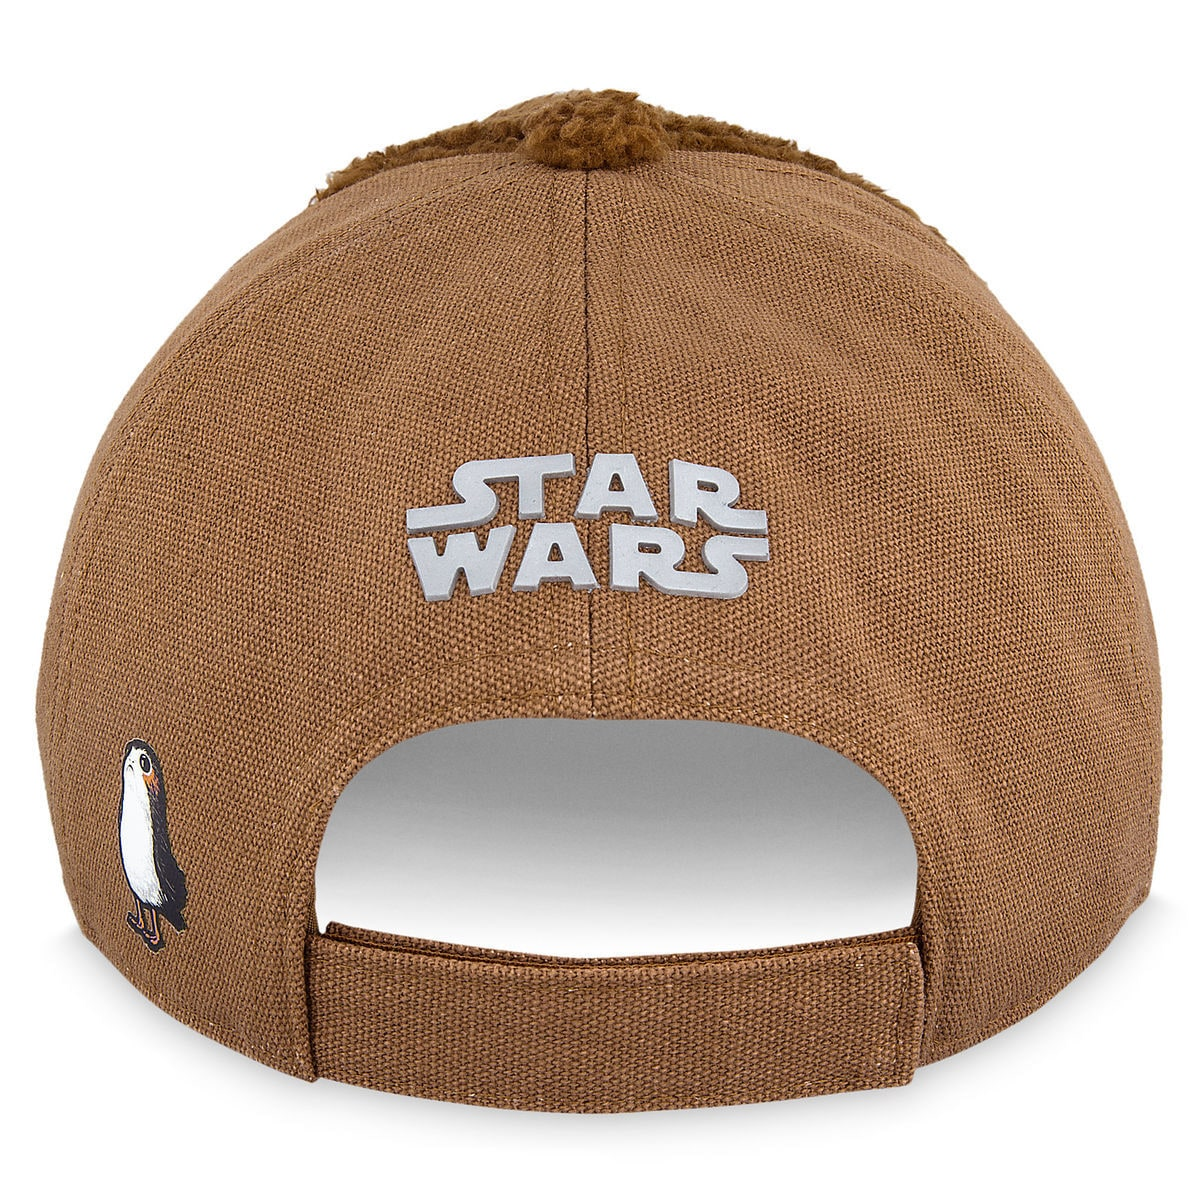 Chewbacca Fuzzy Baseball Cap for Adults - Star Wars  The Last Jedi ... 36cb4042e04